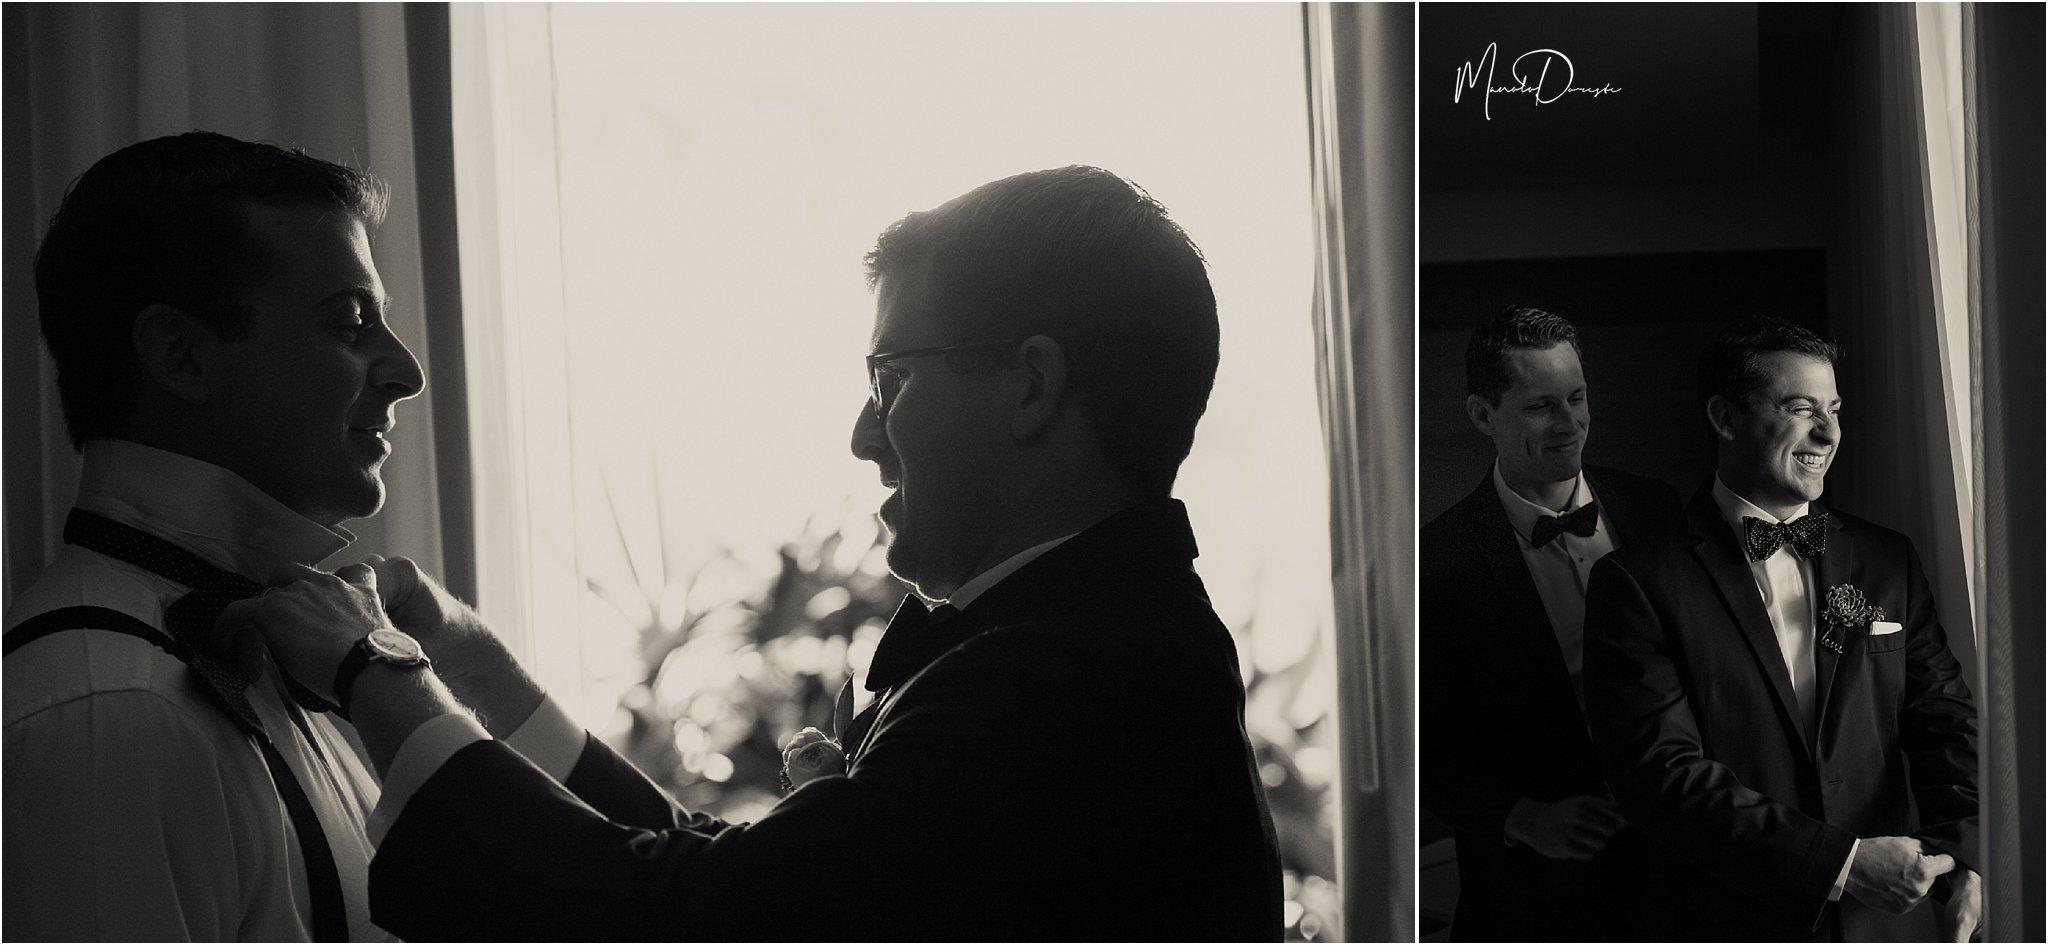 0658_ManoloDoreste_InFocusStudios_Wedding_Family_Photography_Miami_MiamiPhotographer.jpg